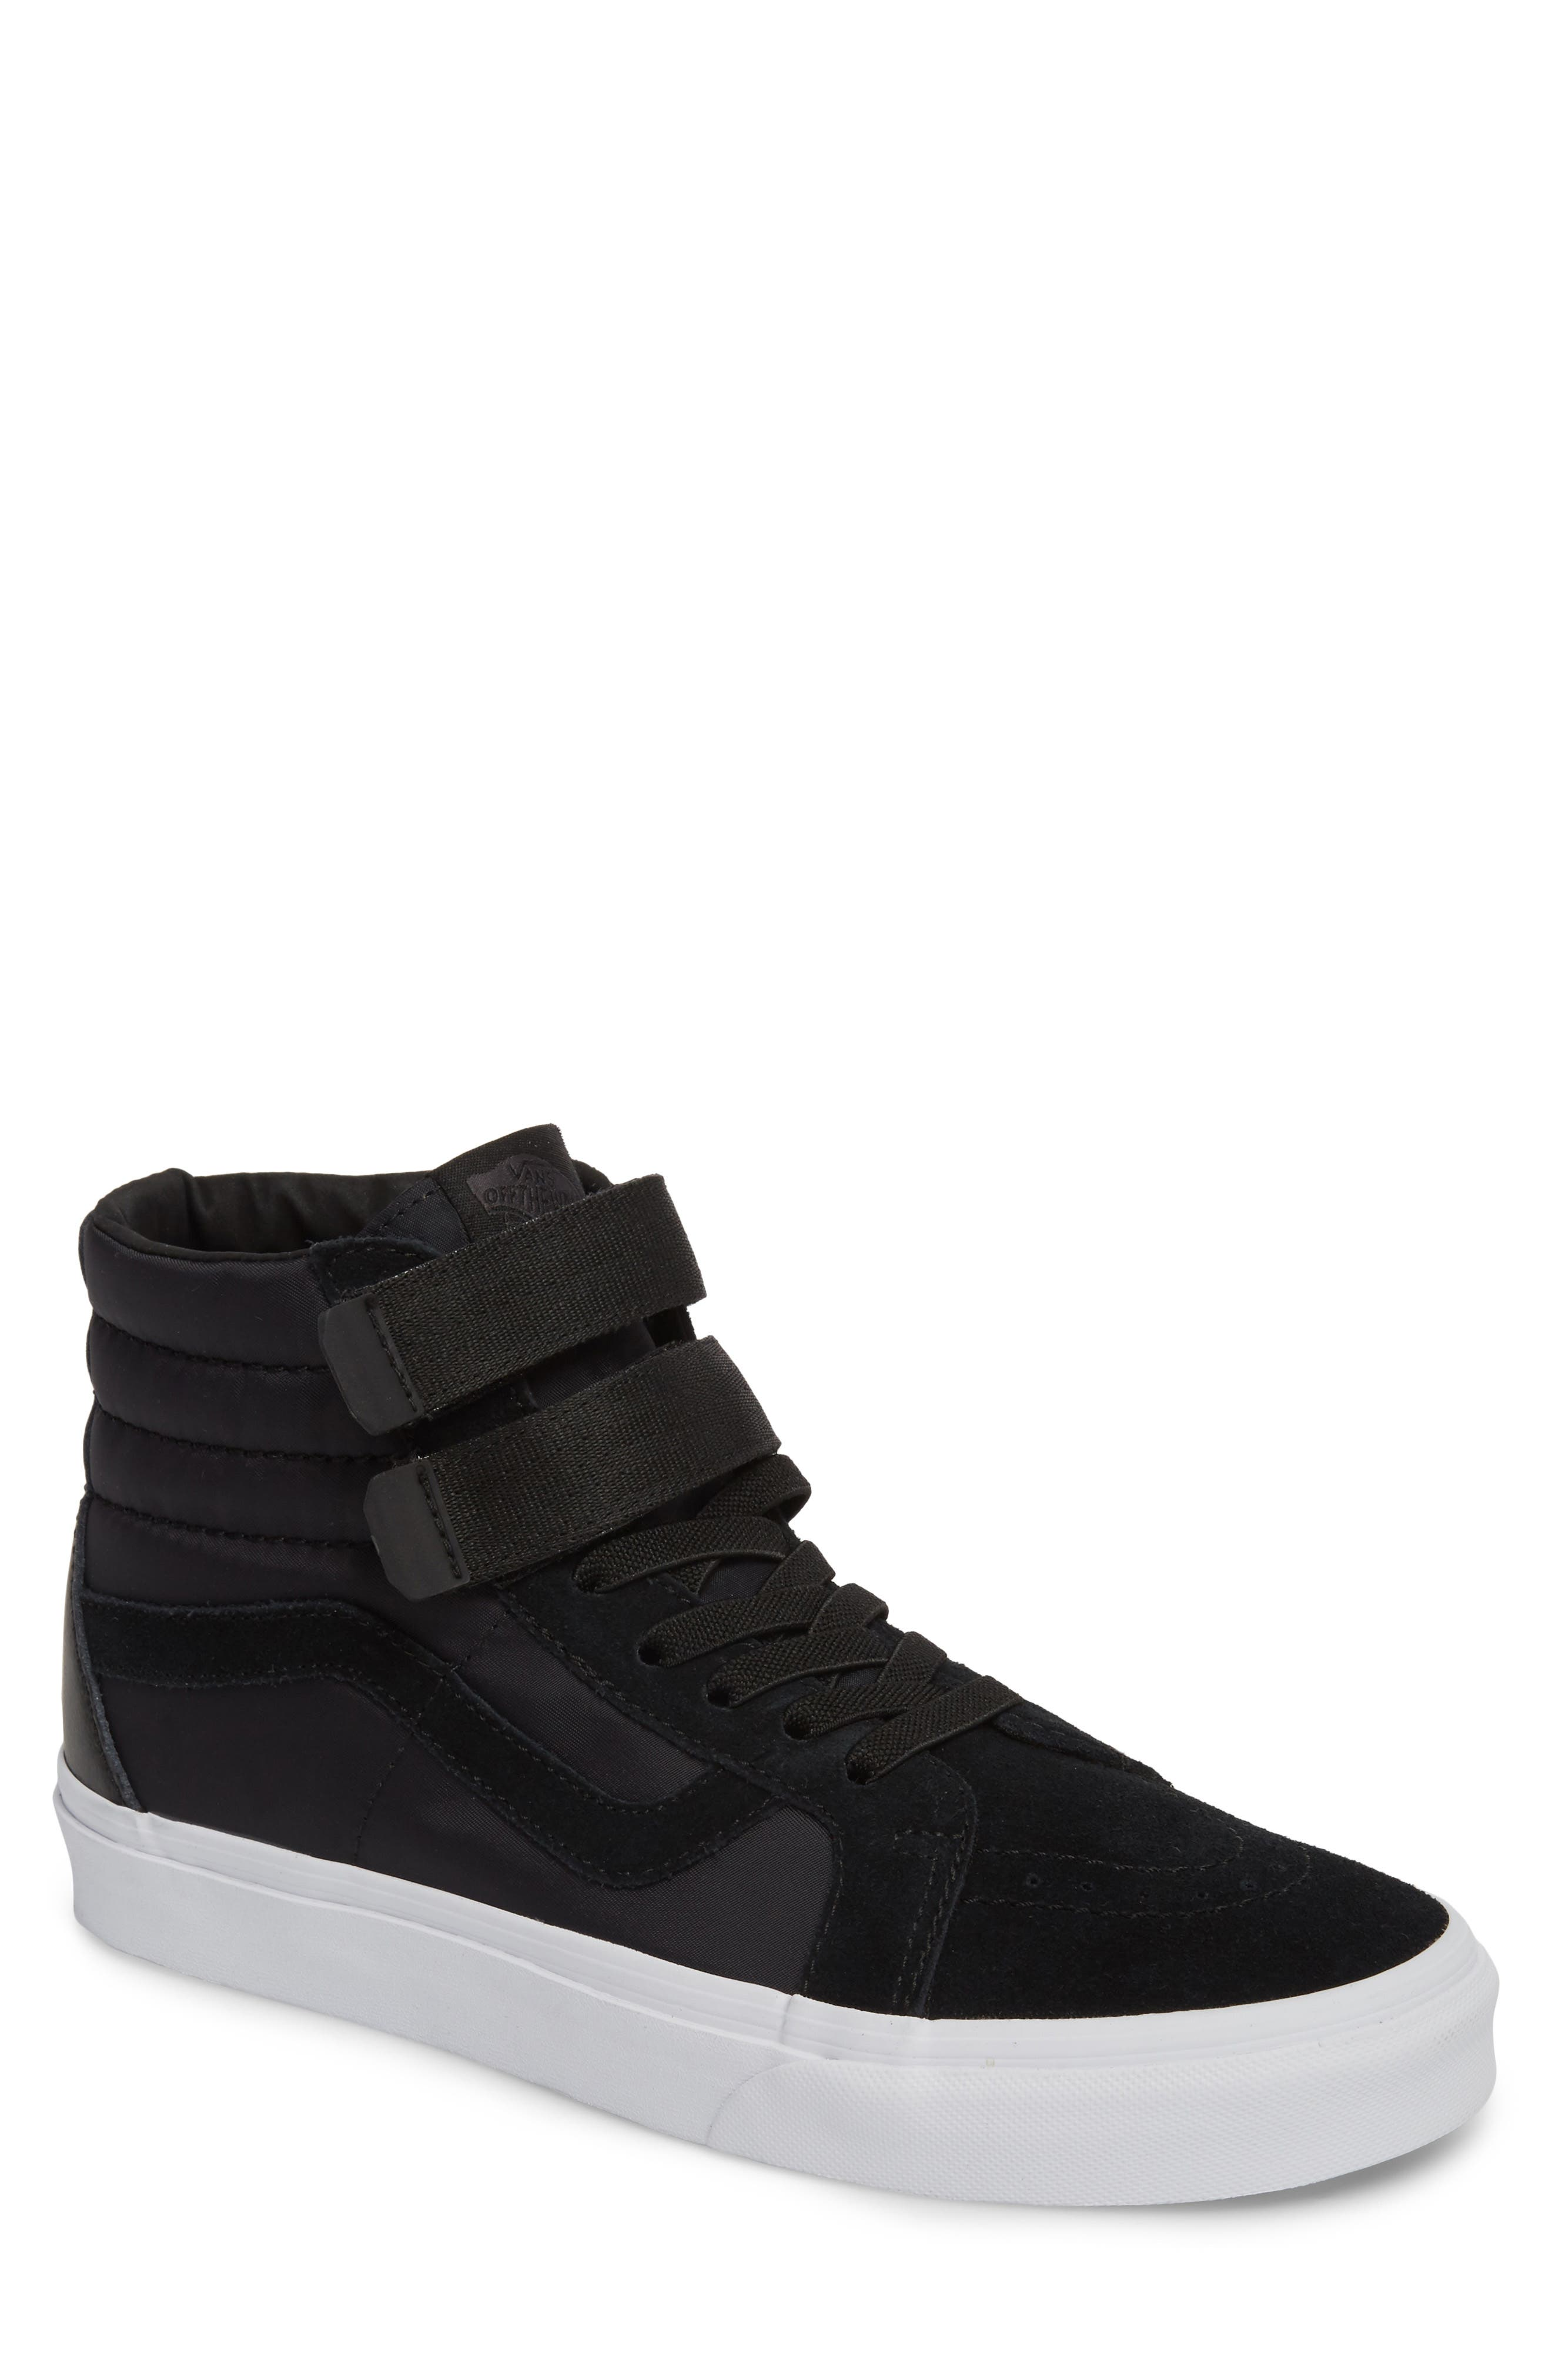 Sk8-Hi Reissue V Sneaker,                         Main,                         color, 002